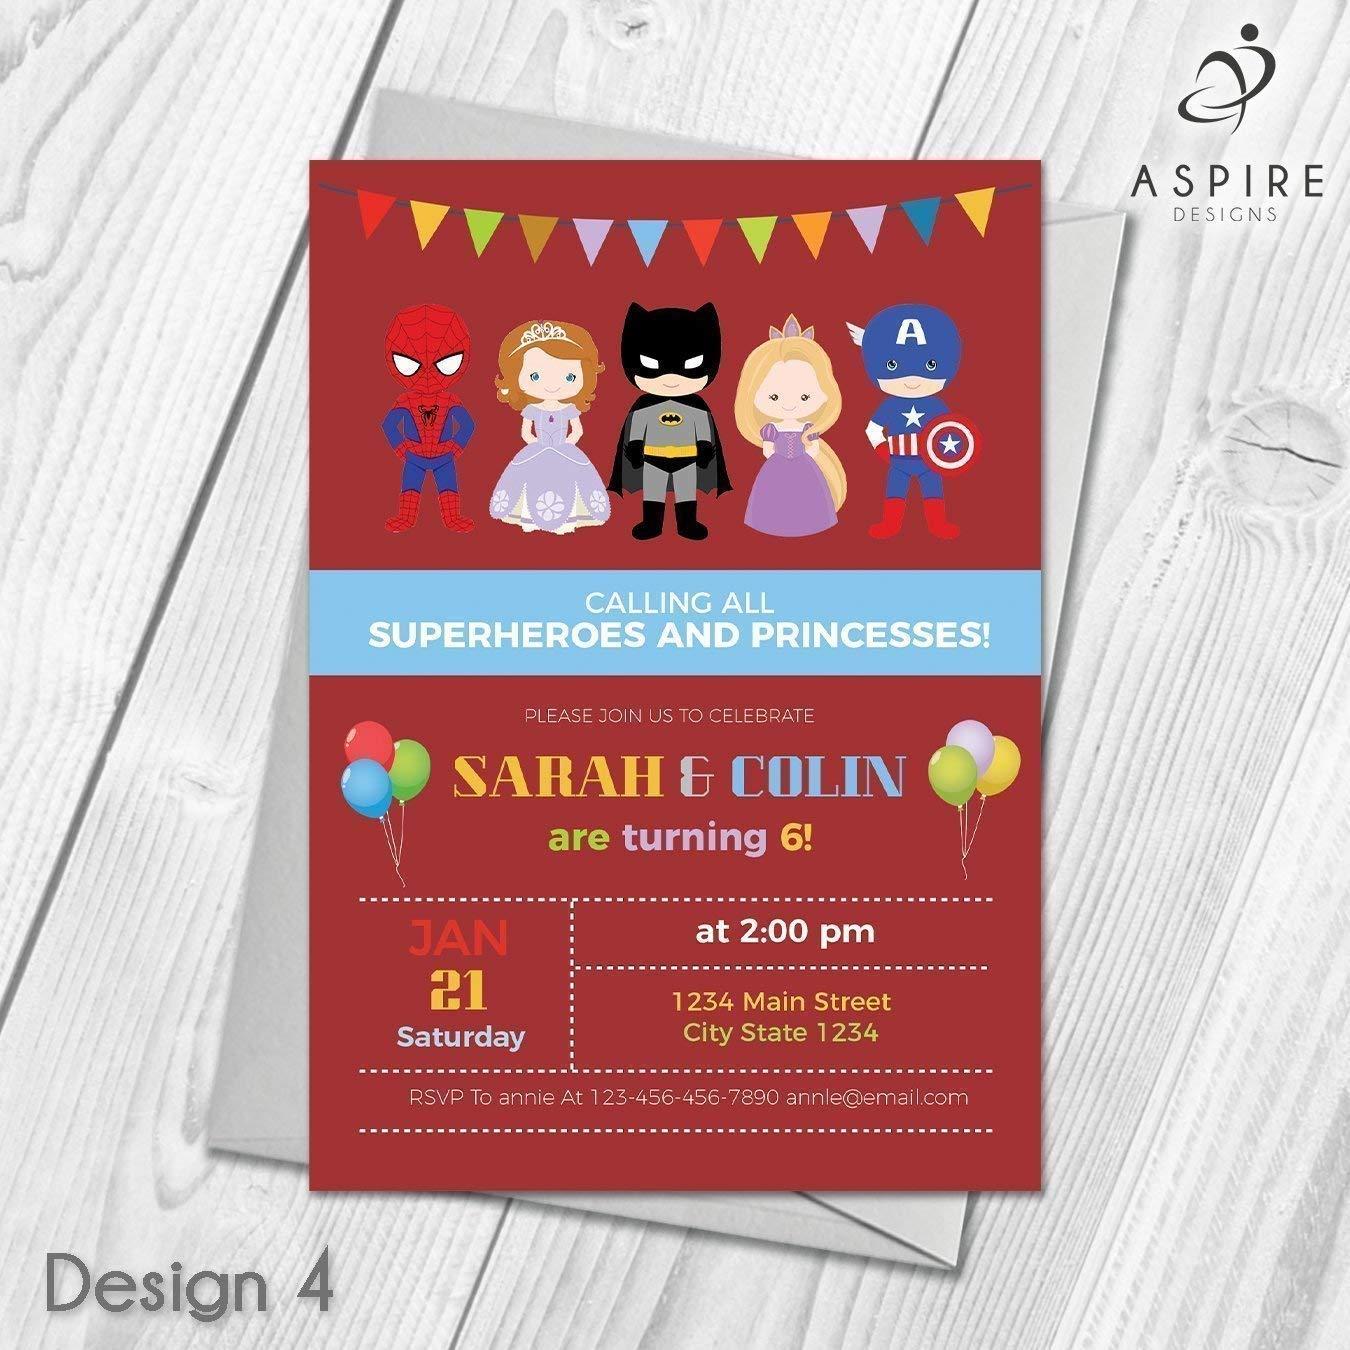 PERSONALISED PRINCESS SUPER HERO JOINT BIRTHDAY PARTY INVITATIONS KIDS INVITES